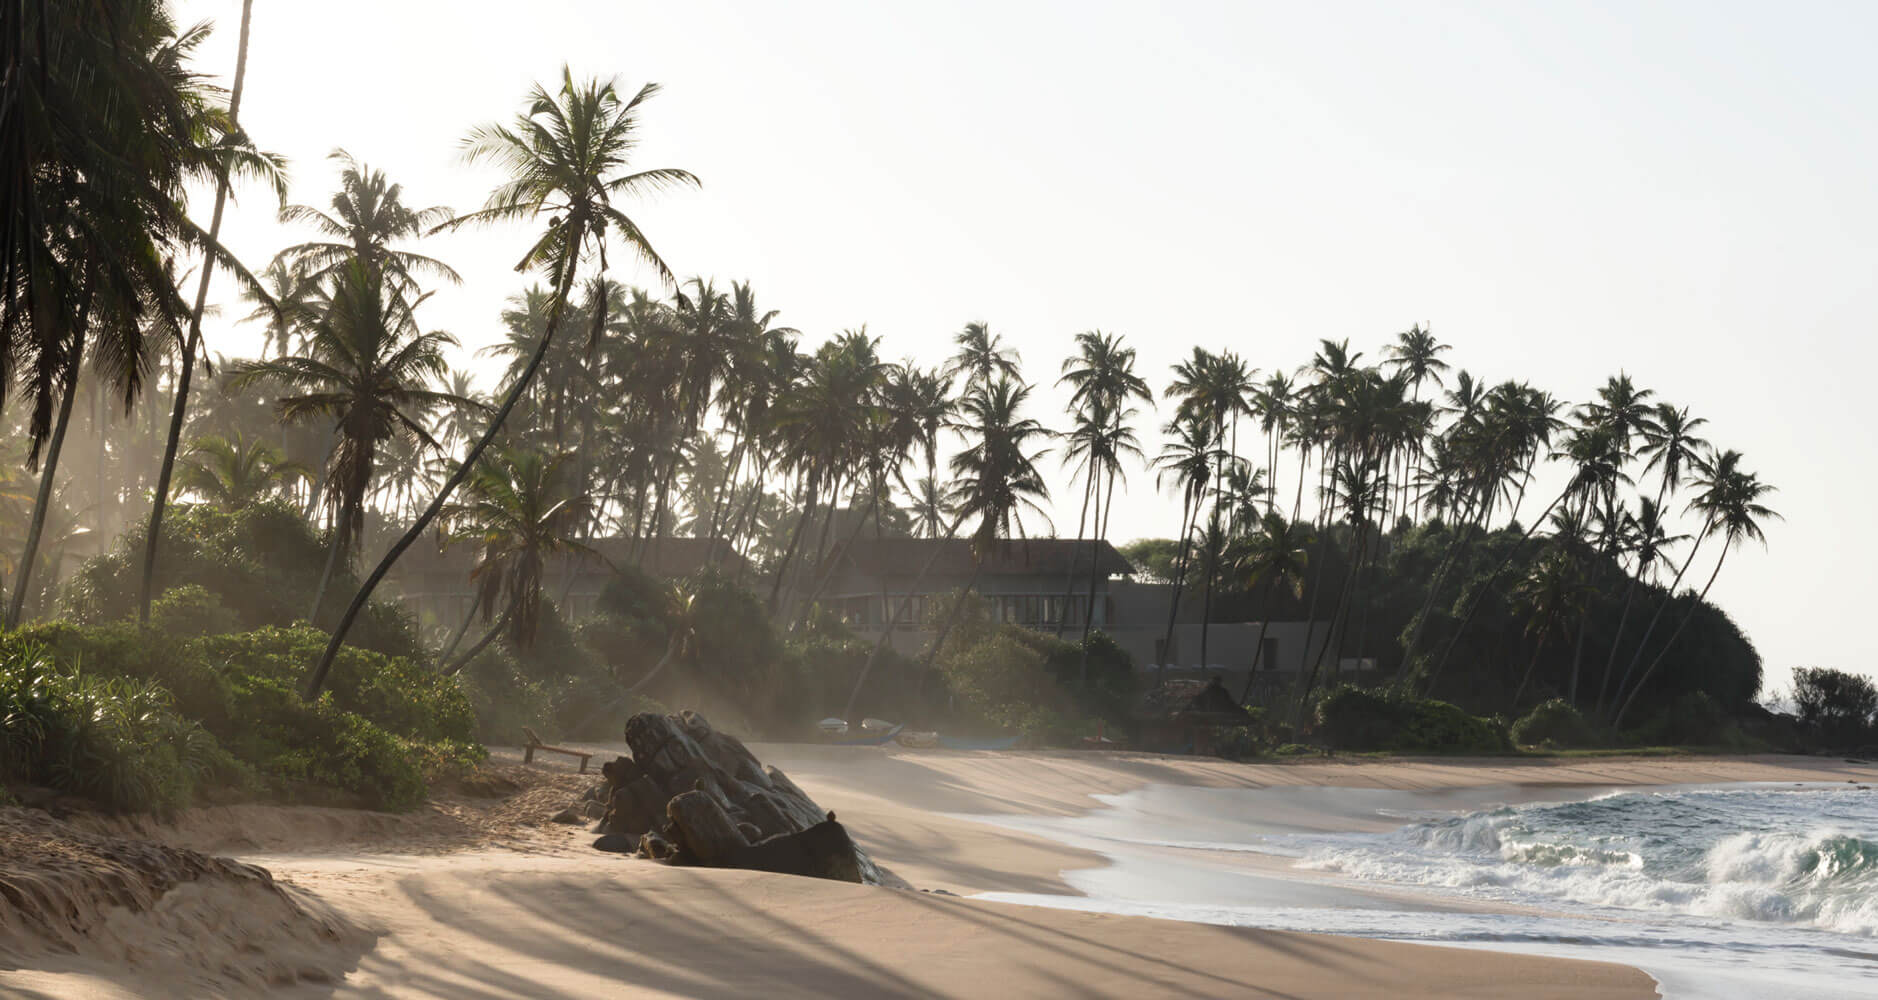 Decompress on the beach